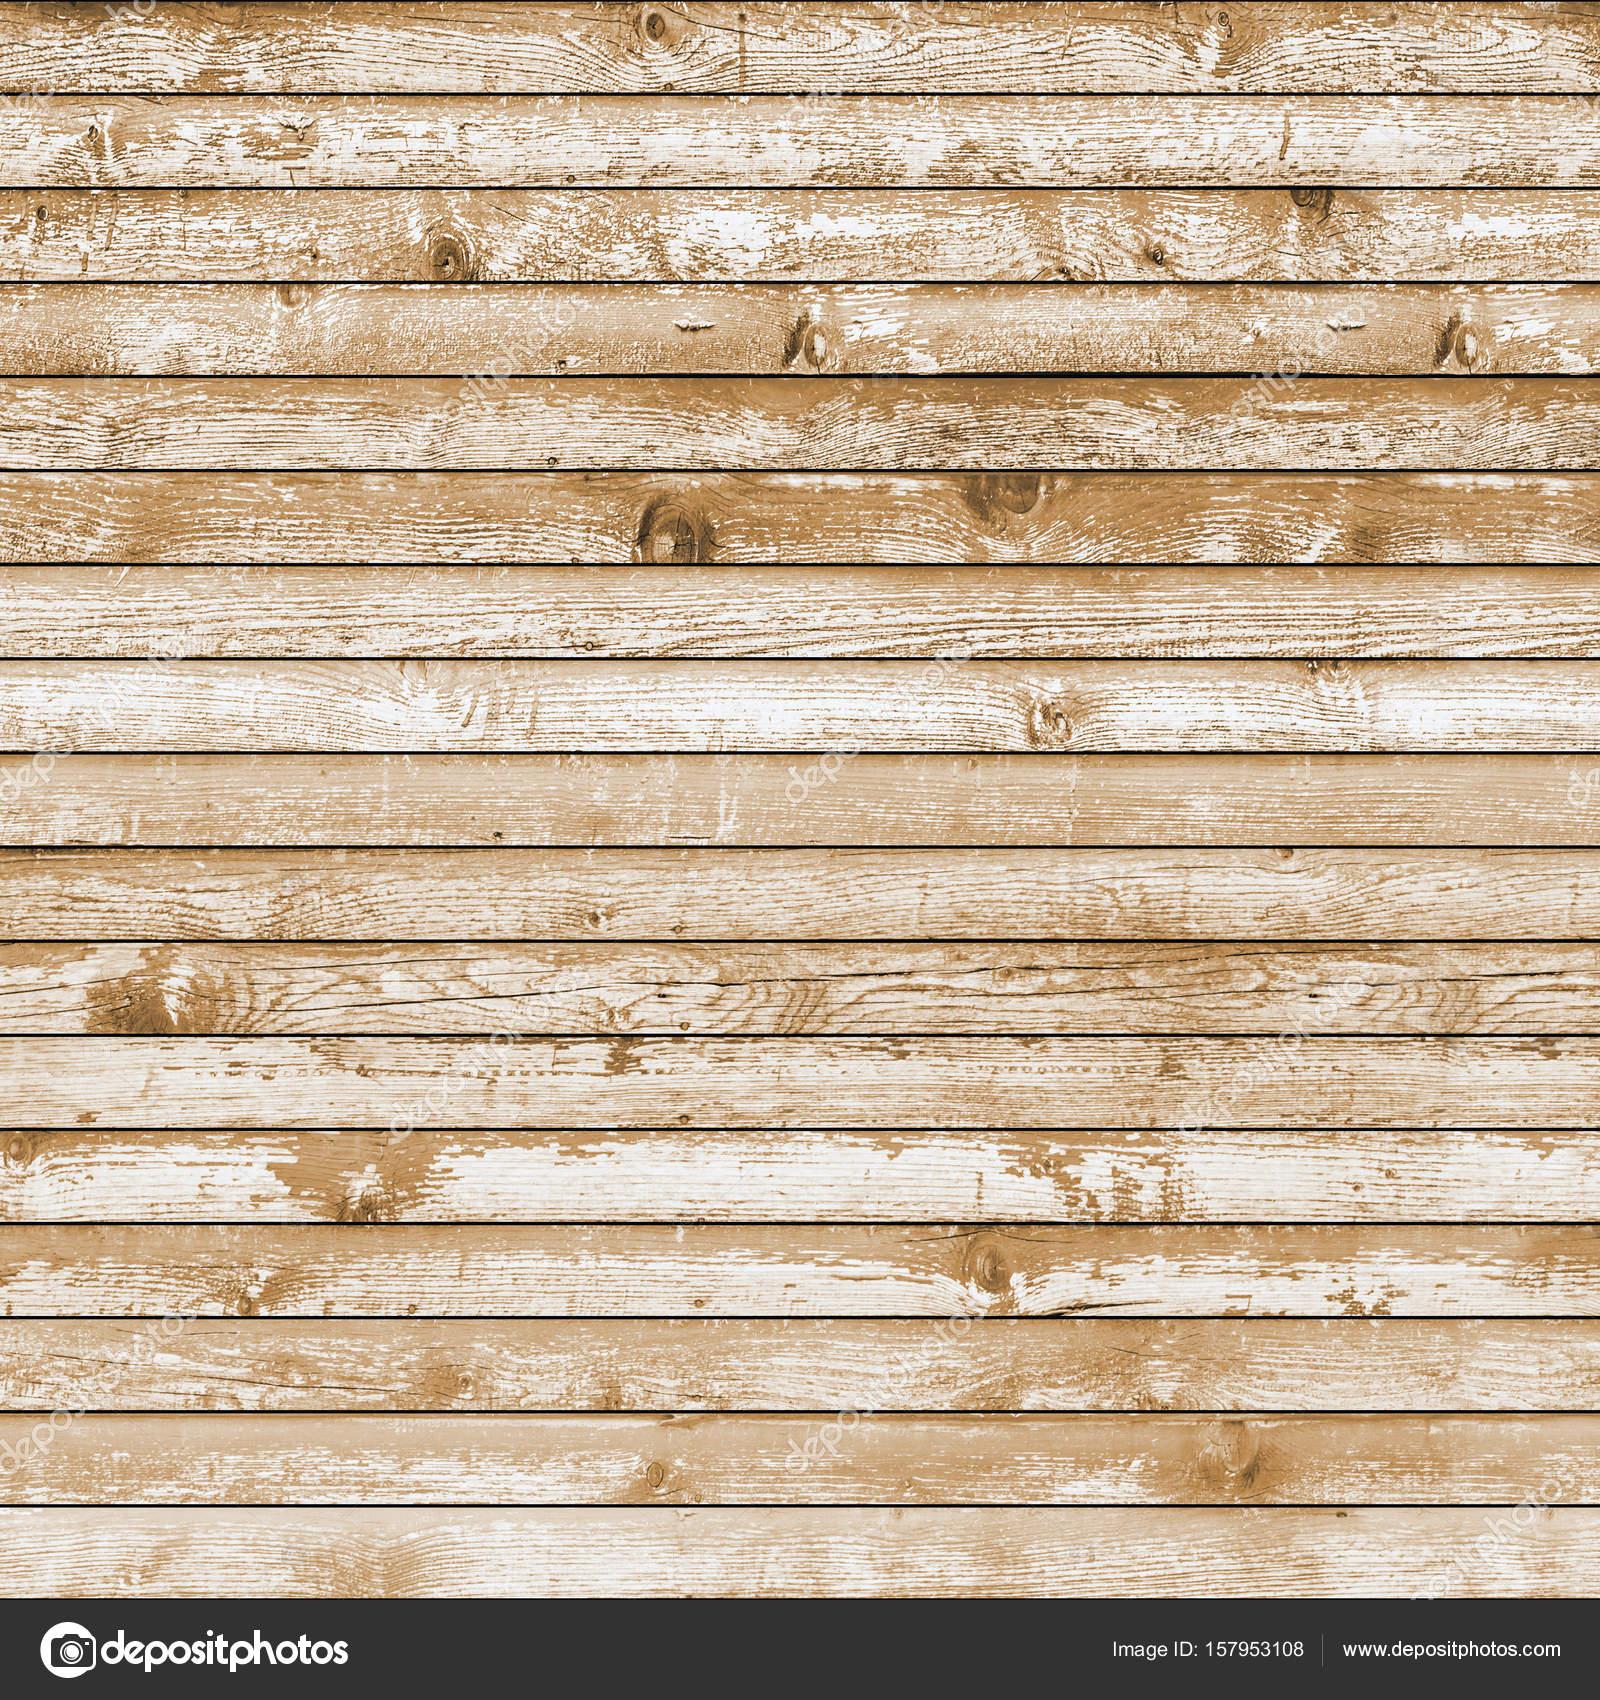 Baldosa de madera de tablones Fotos de Stock 1xpert 157953108